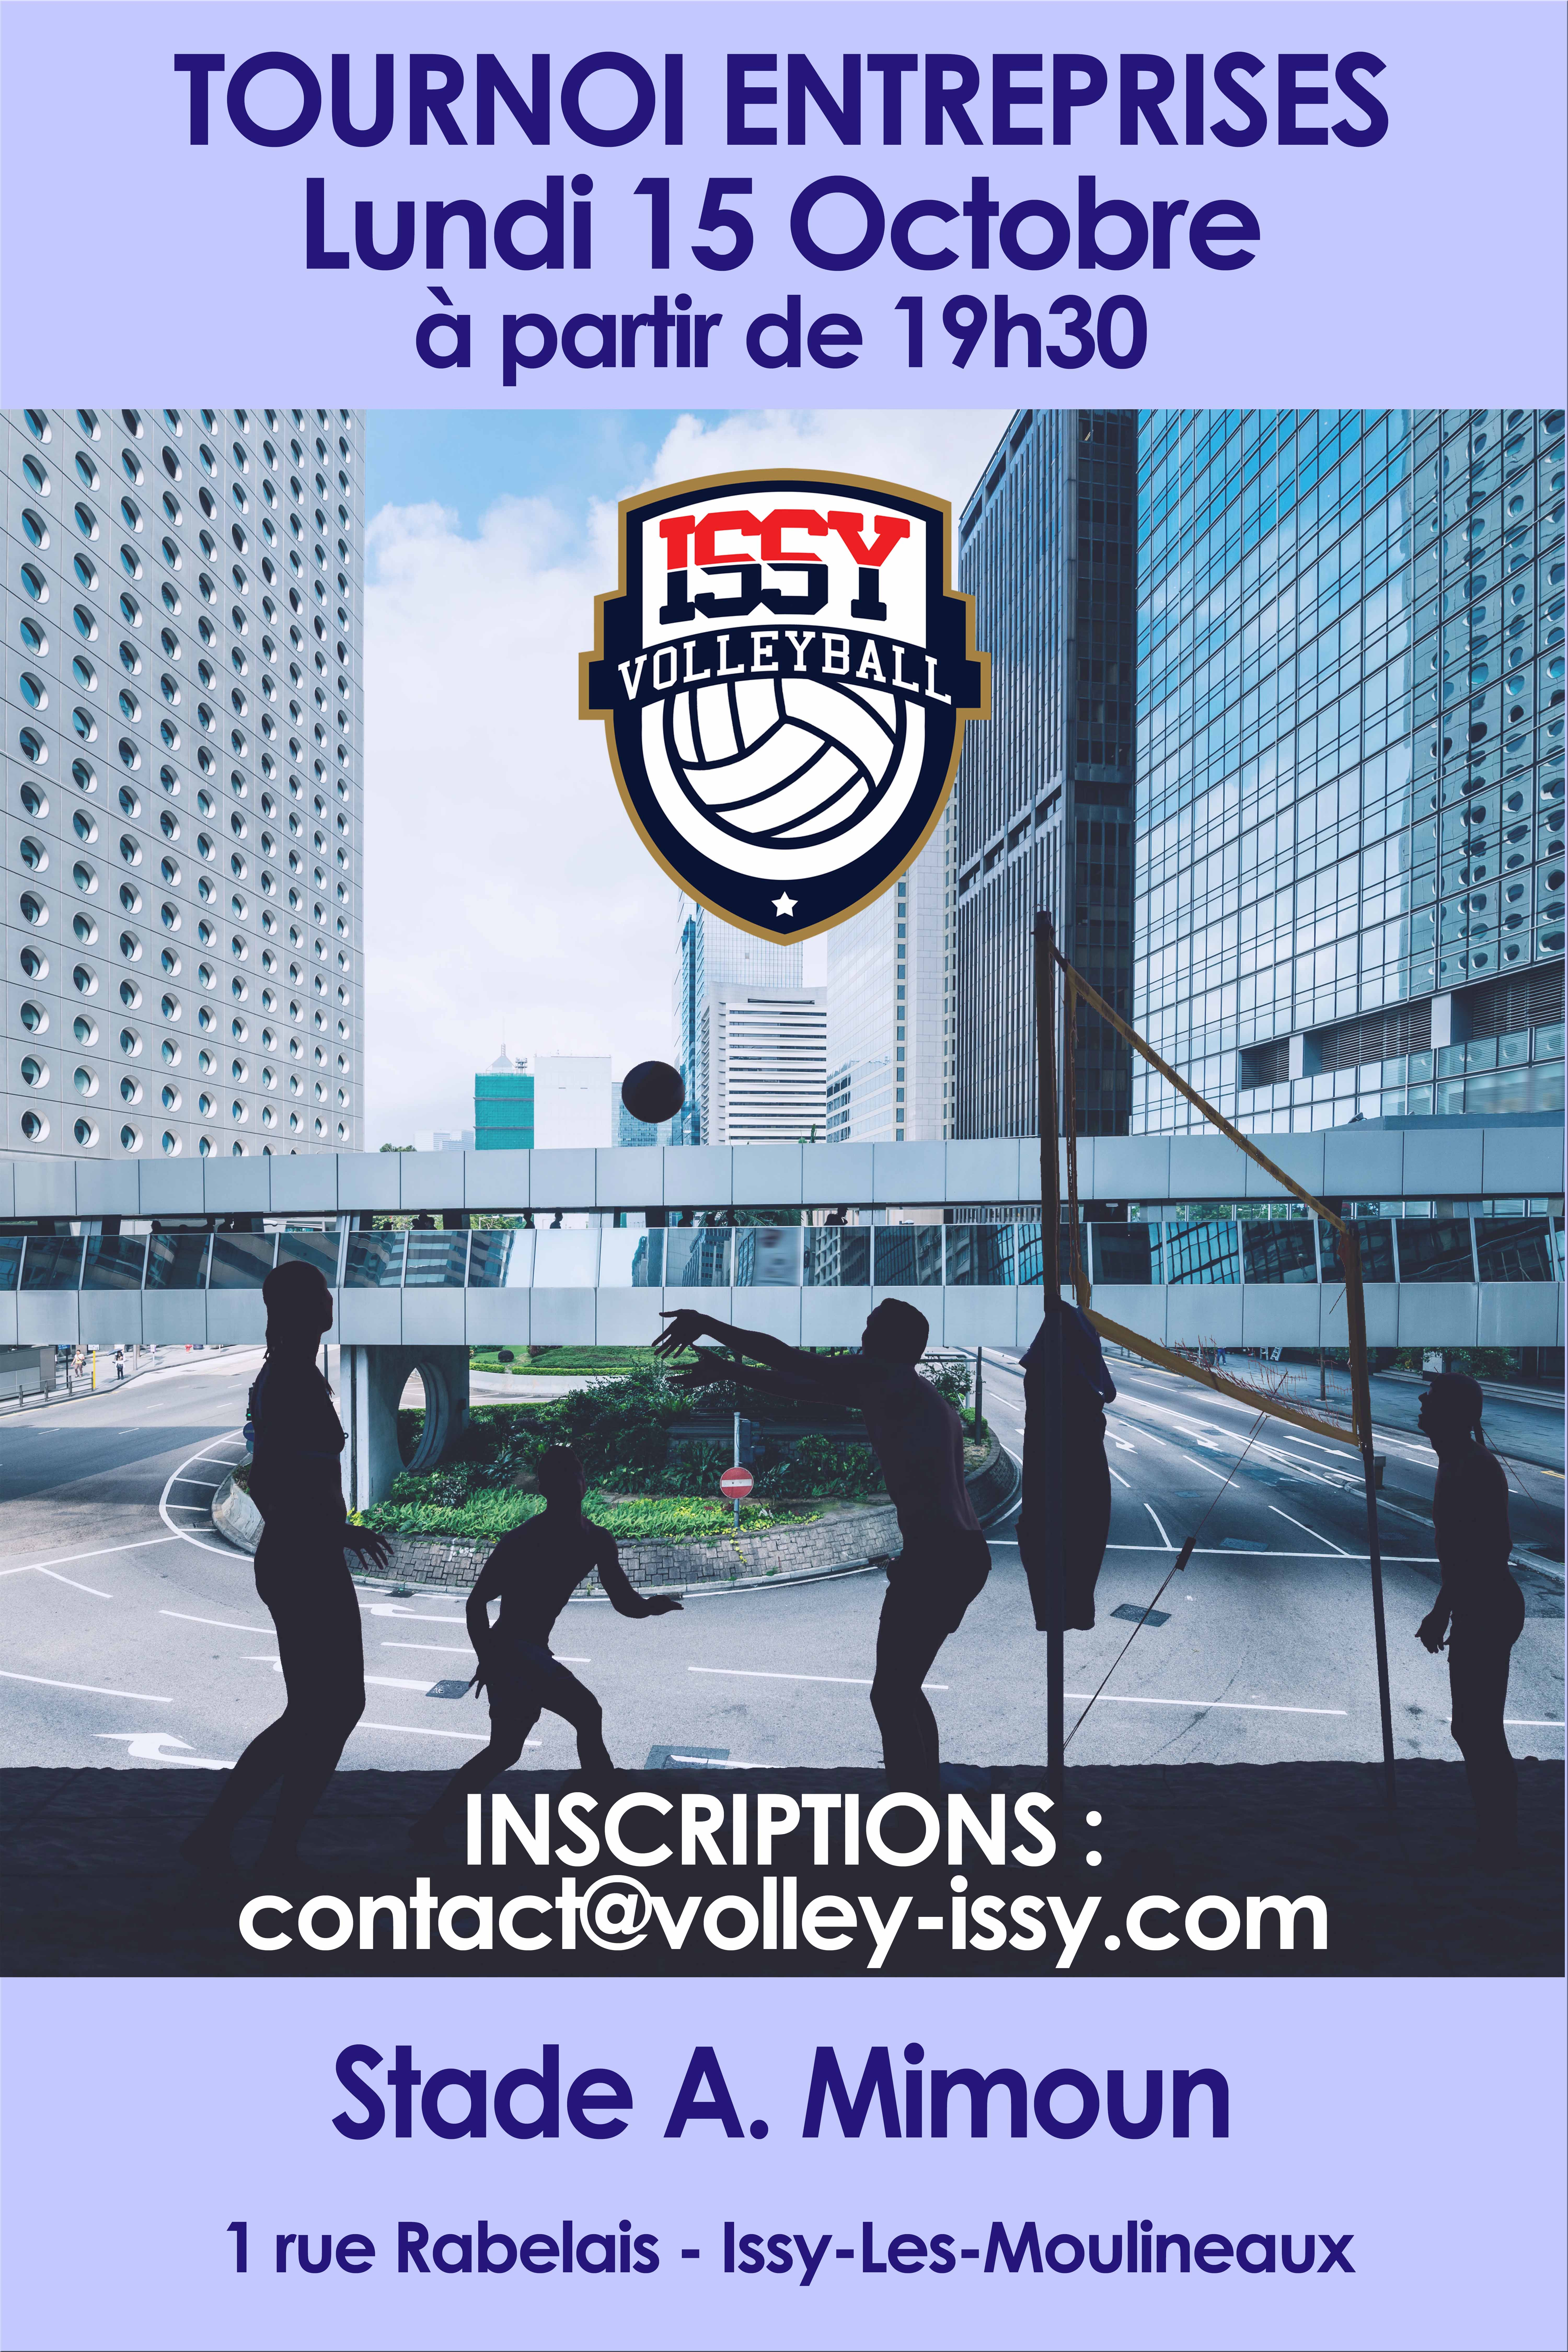 TOURNOI INTER ENTREPRISES LE 15 OCTOBRE 2018